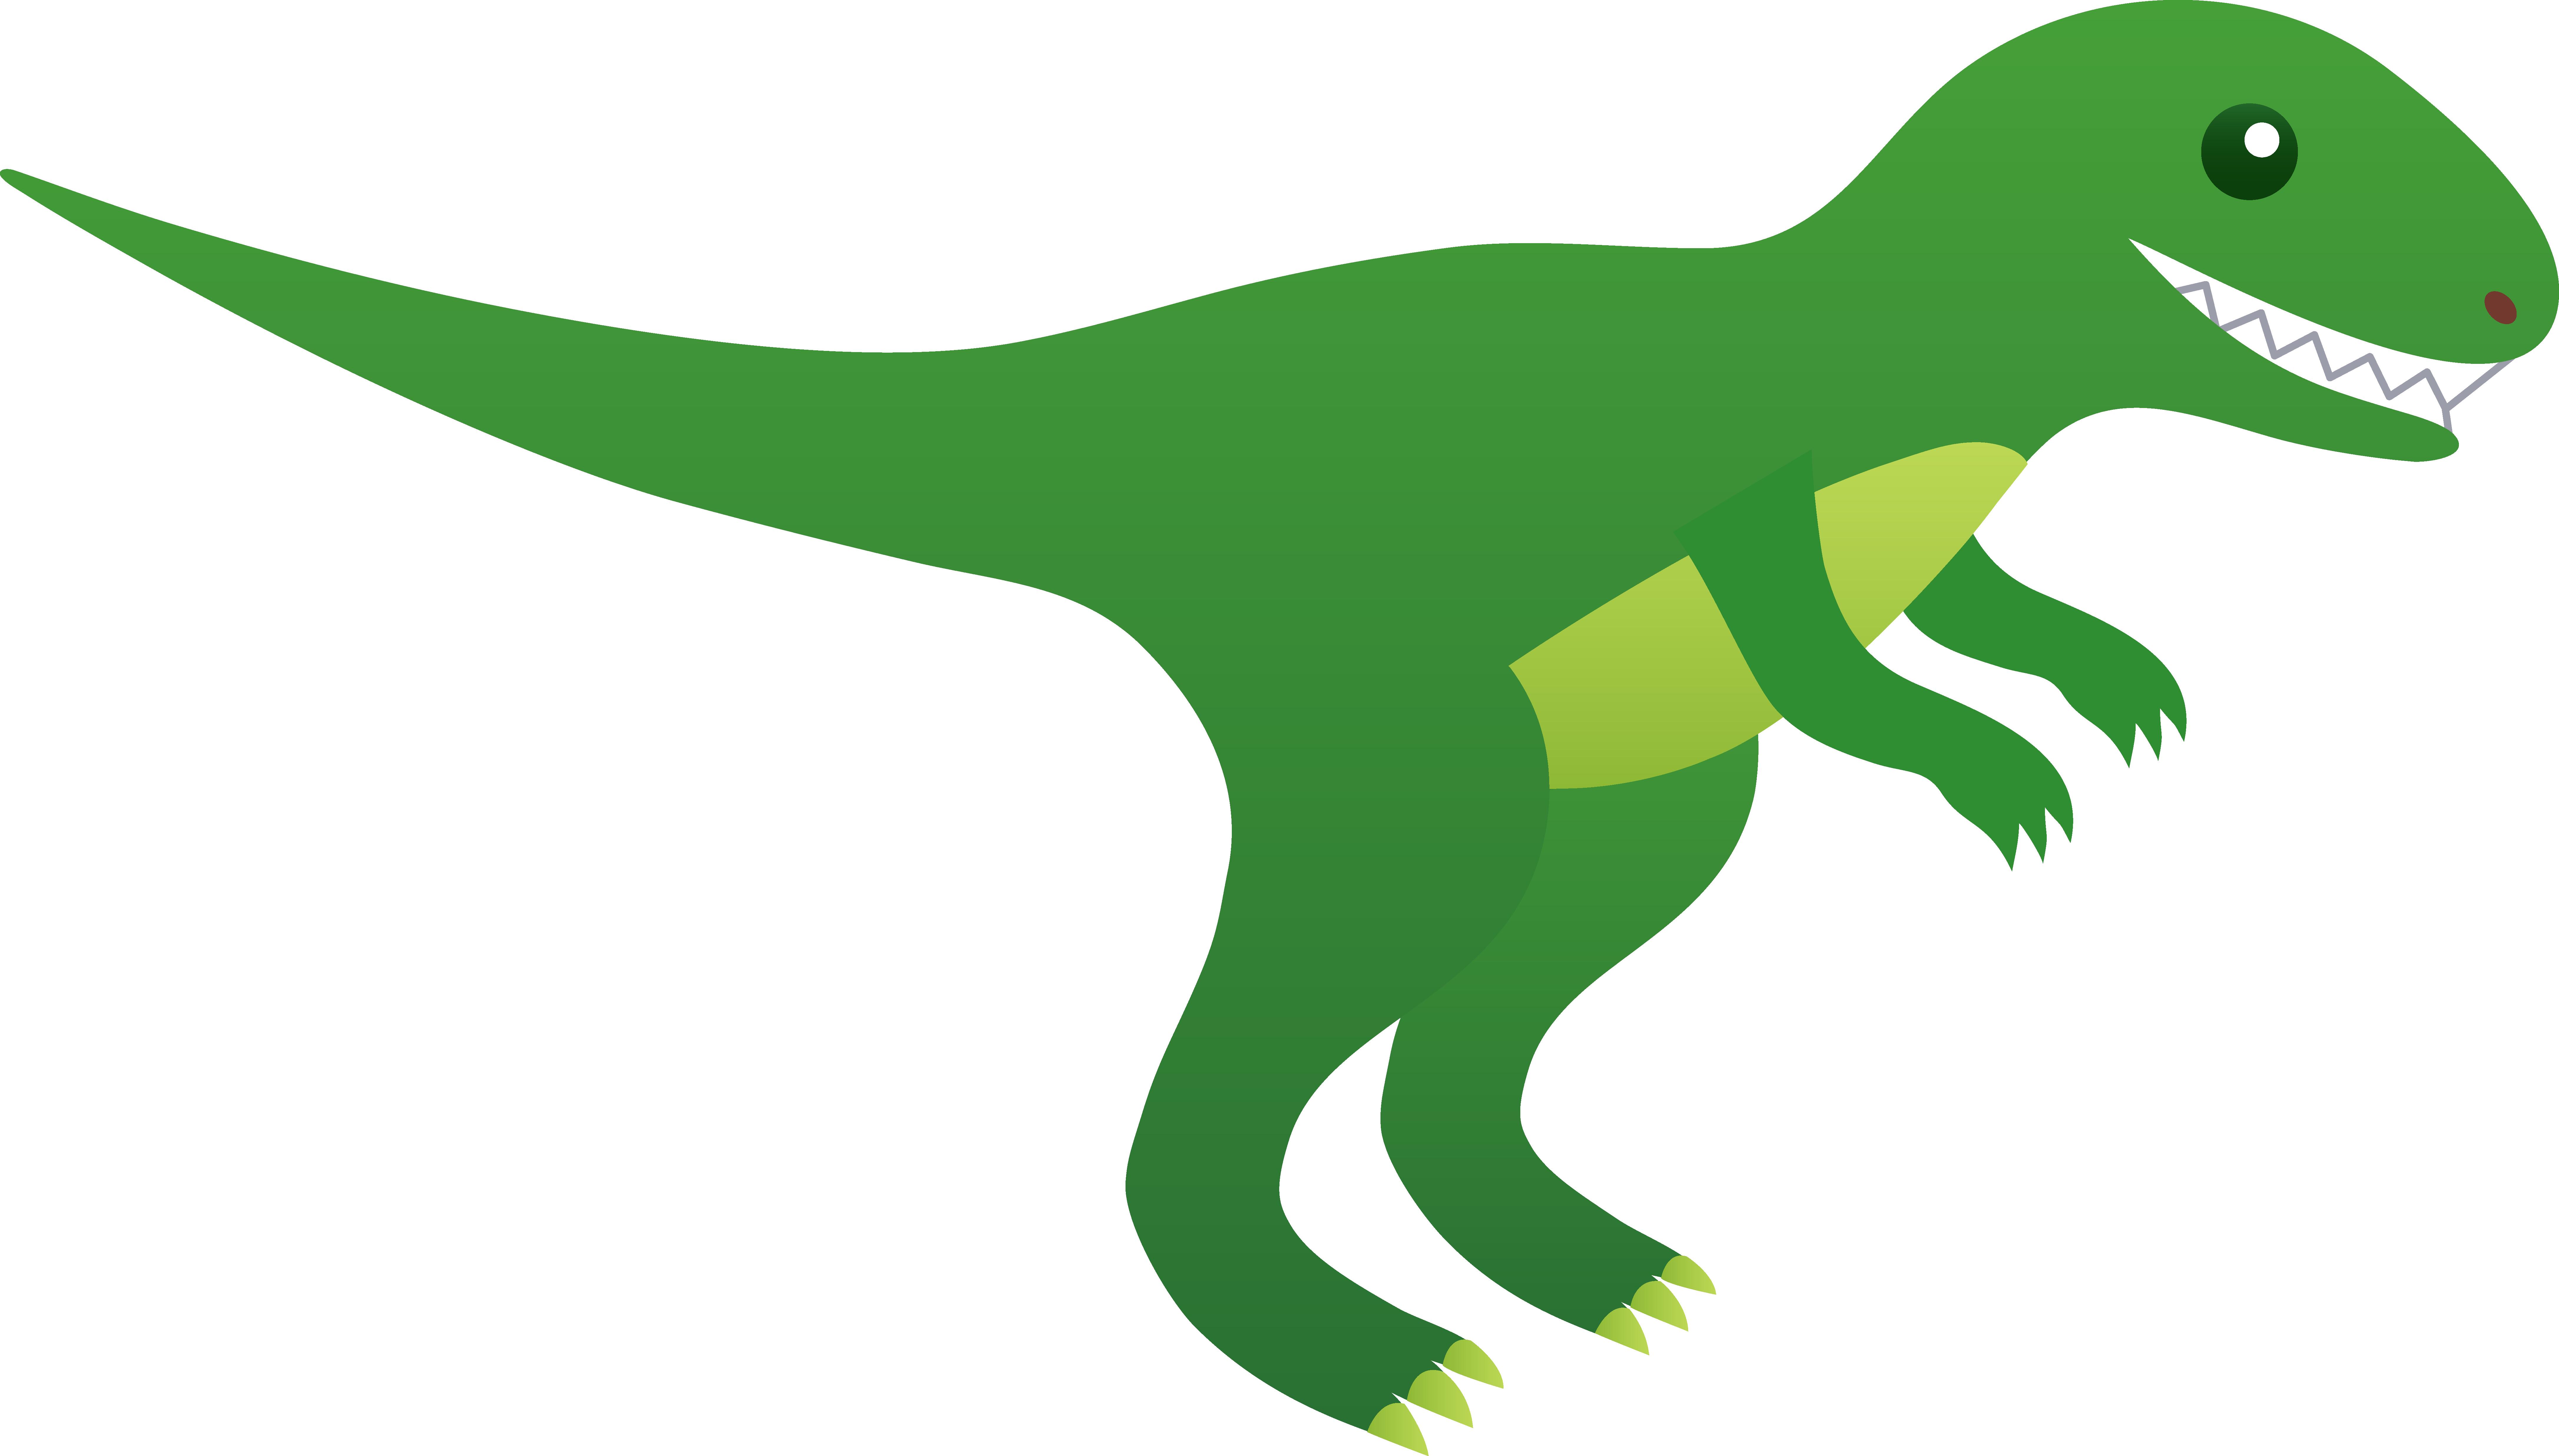 8692x4946 Tyrannosaurus Rex Dinosaur